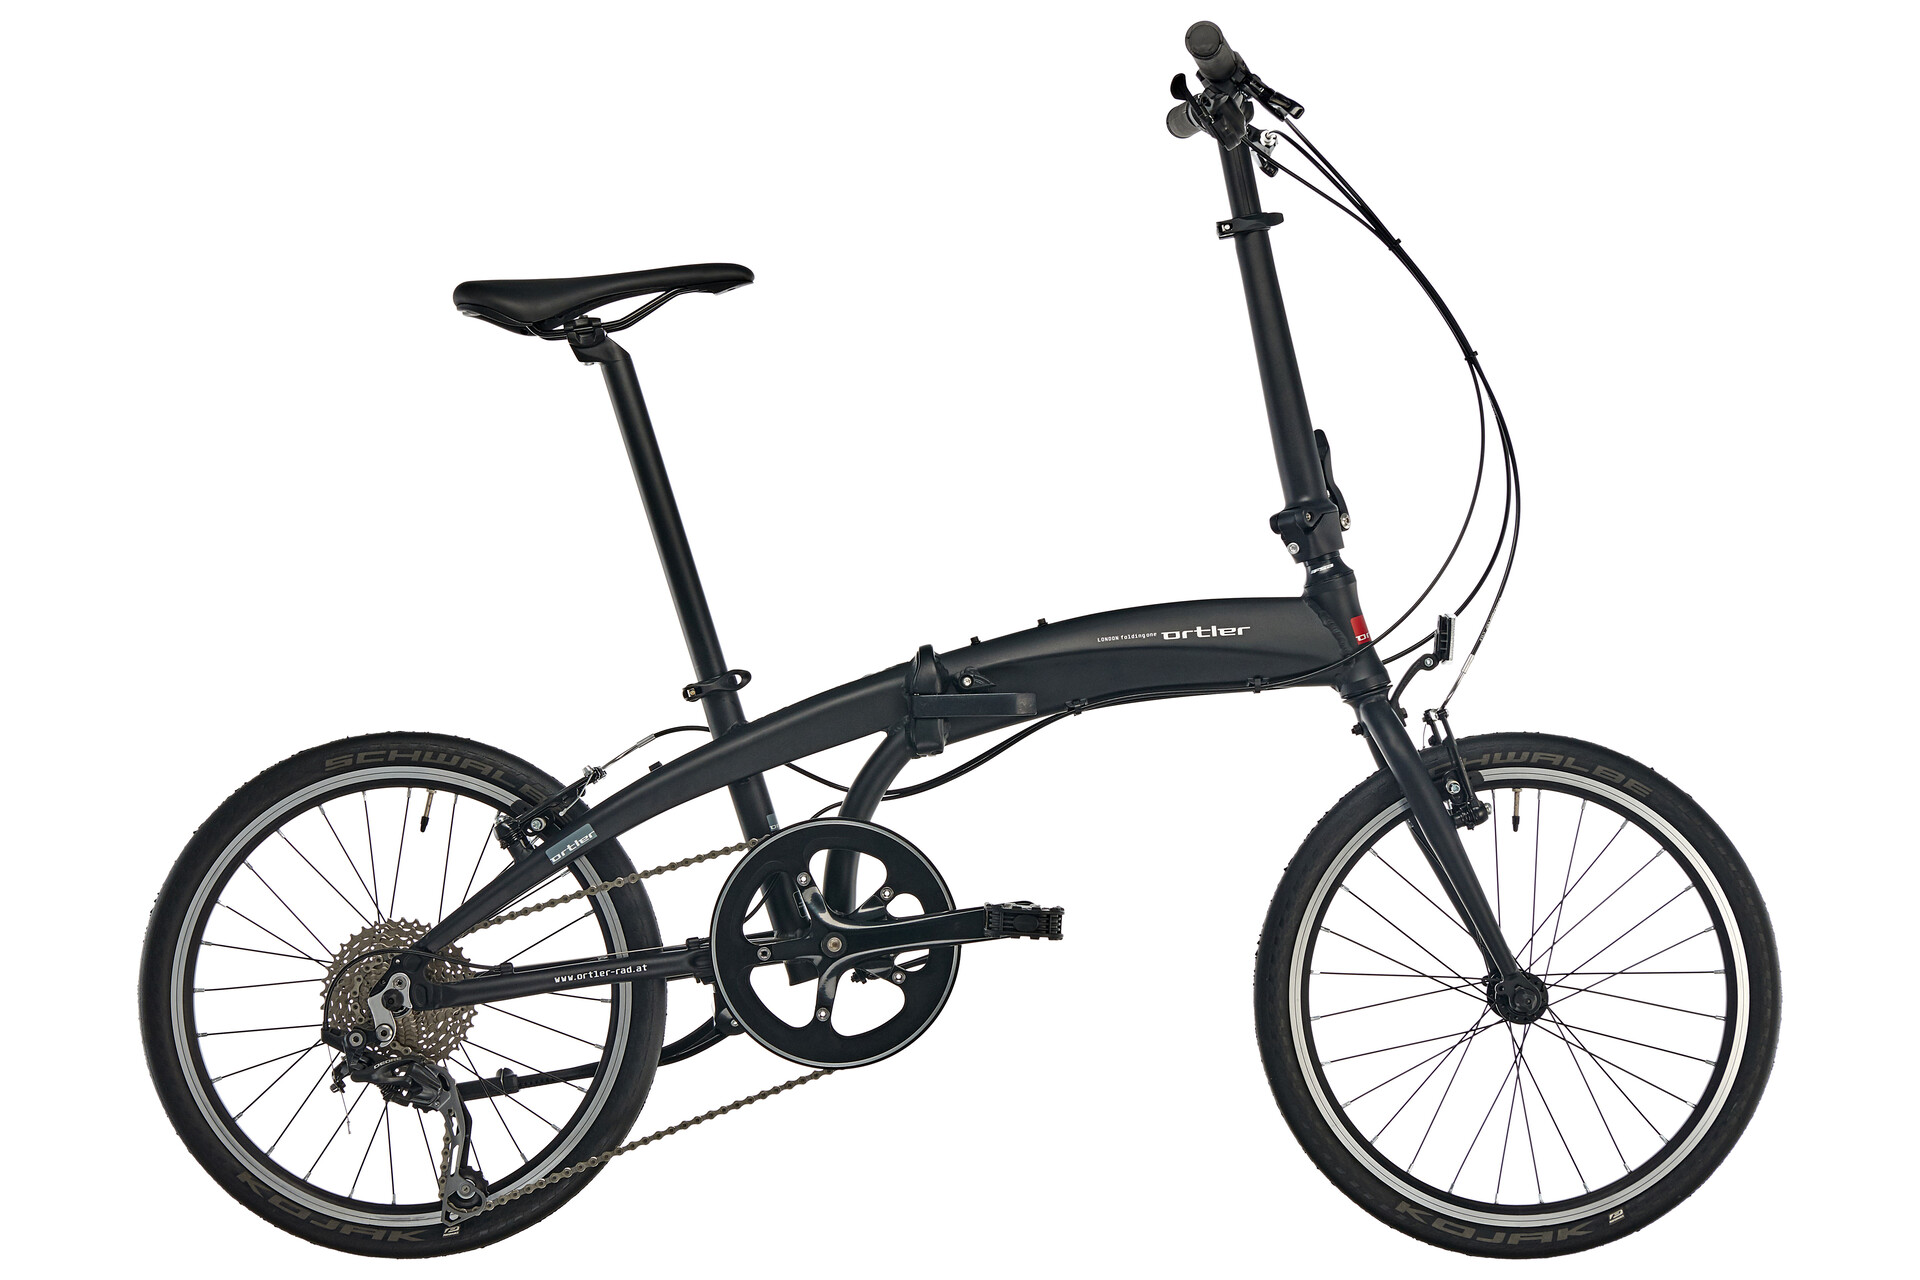 ortler london race elite folding bike black at bikester co uk Fast Jacket ortler london race elite folding bike black